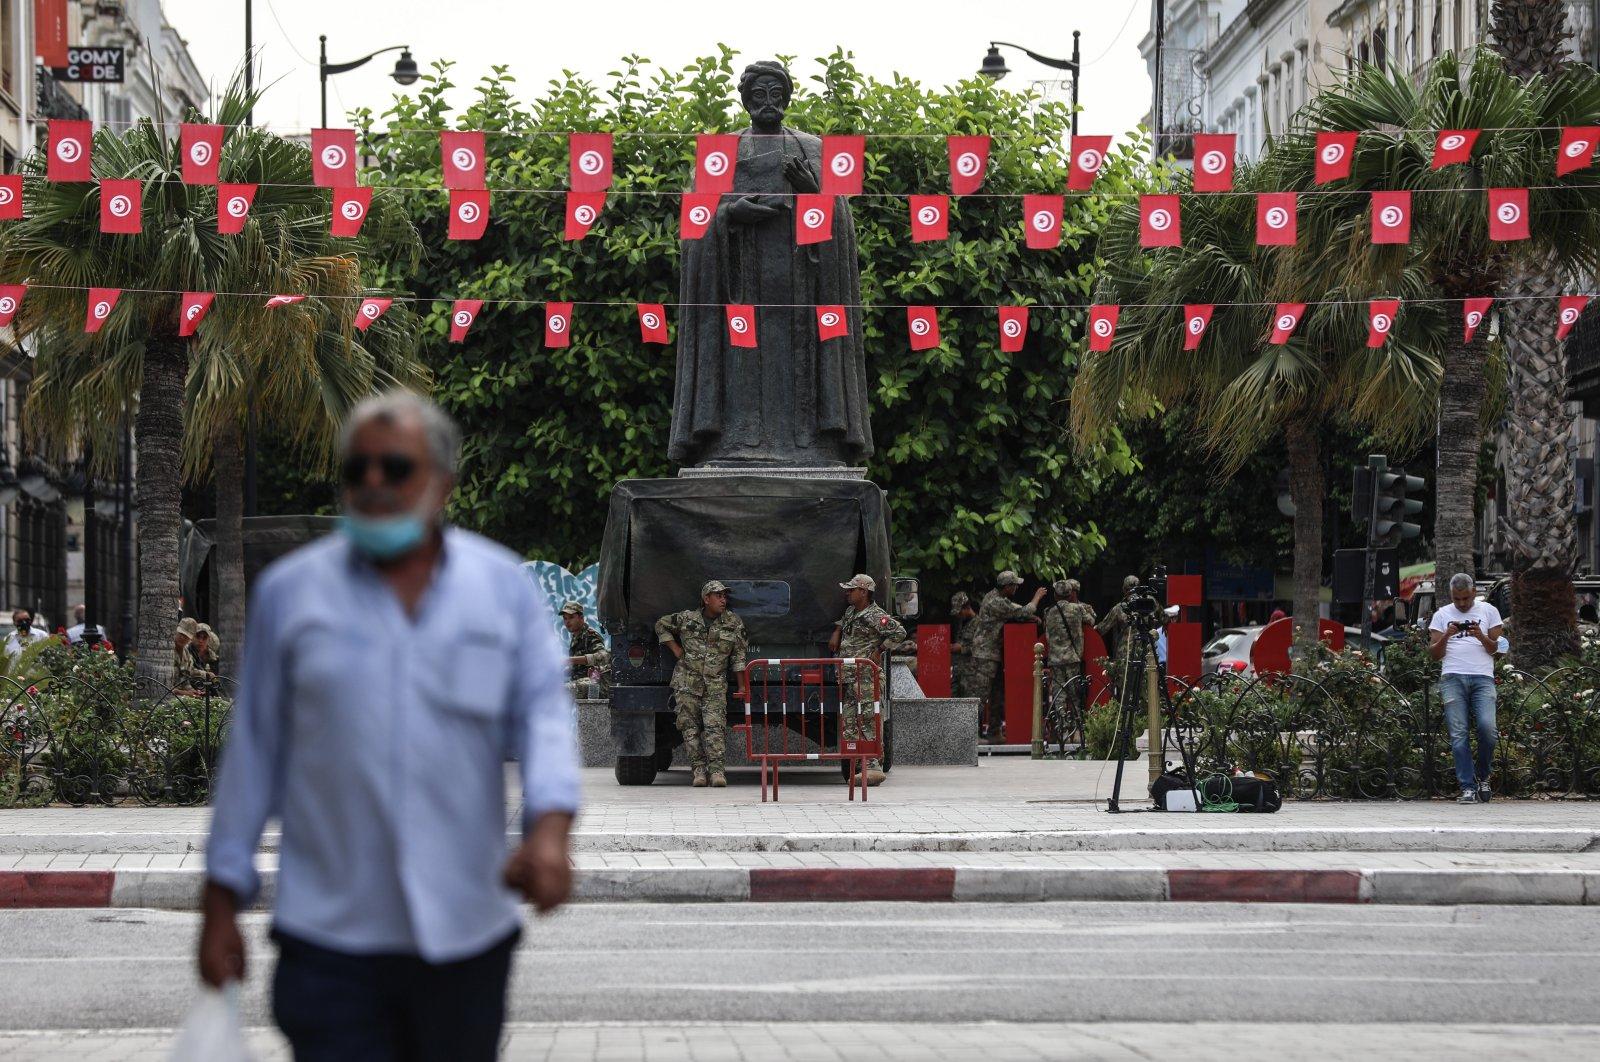 The Tunisian army monitors the main street Habib Bourguiba, in Tunis, Tunisia, July 27, 2021. (EPA Photo)